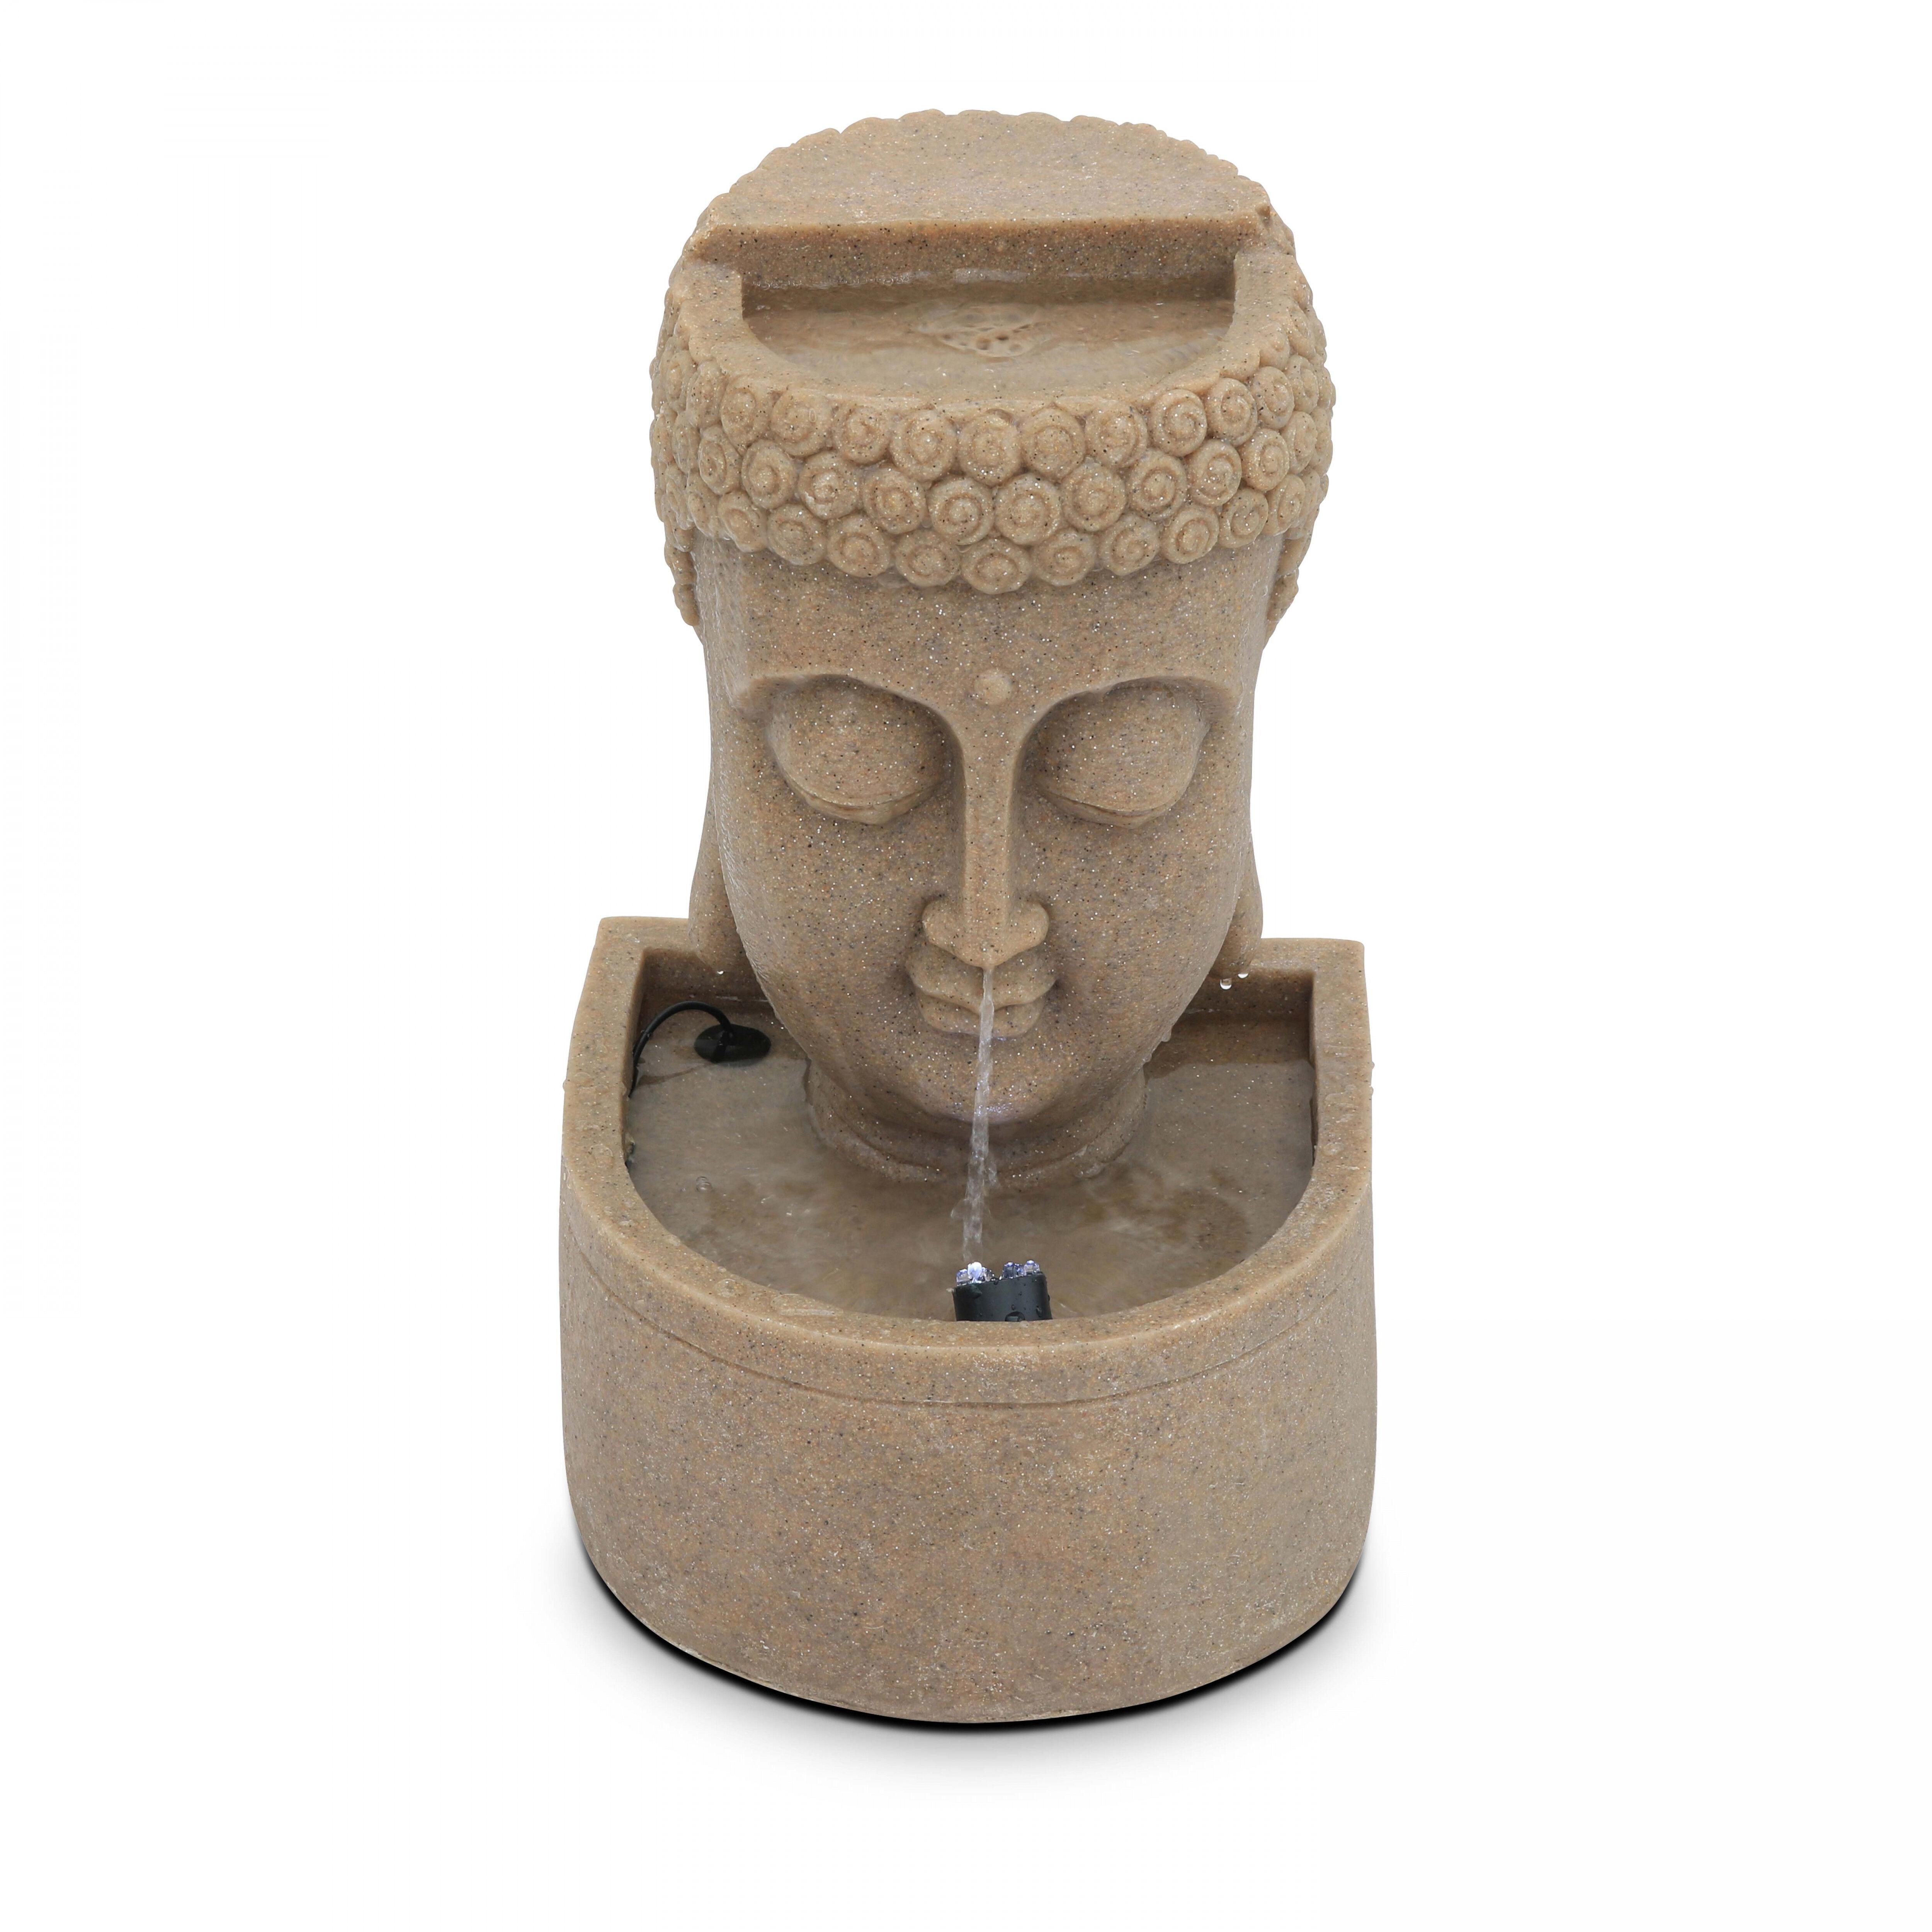 Oviala Fontaine bouddha pierre reconstituée LED beige